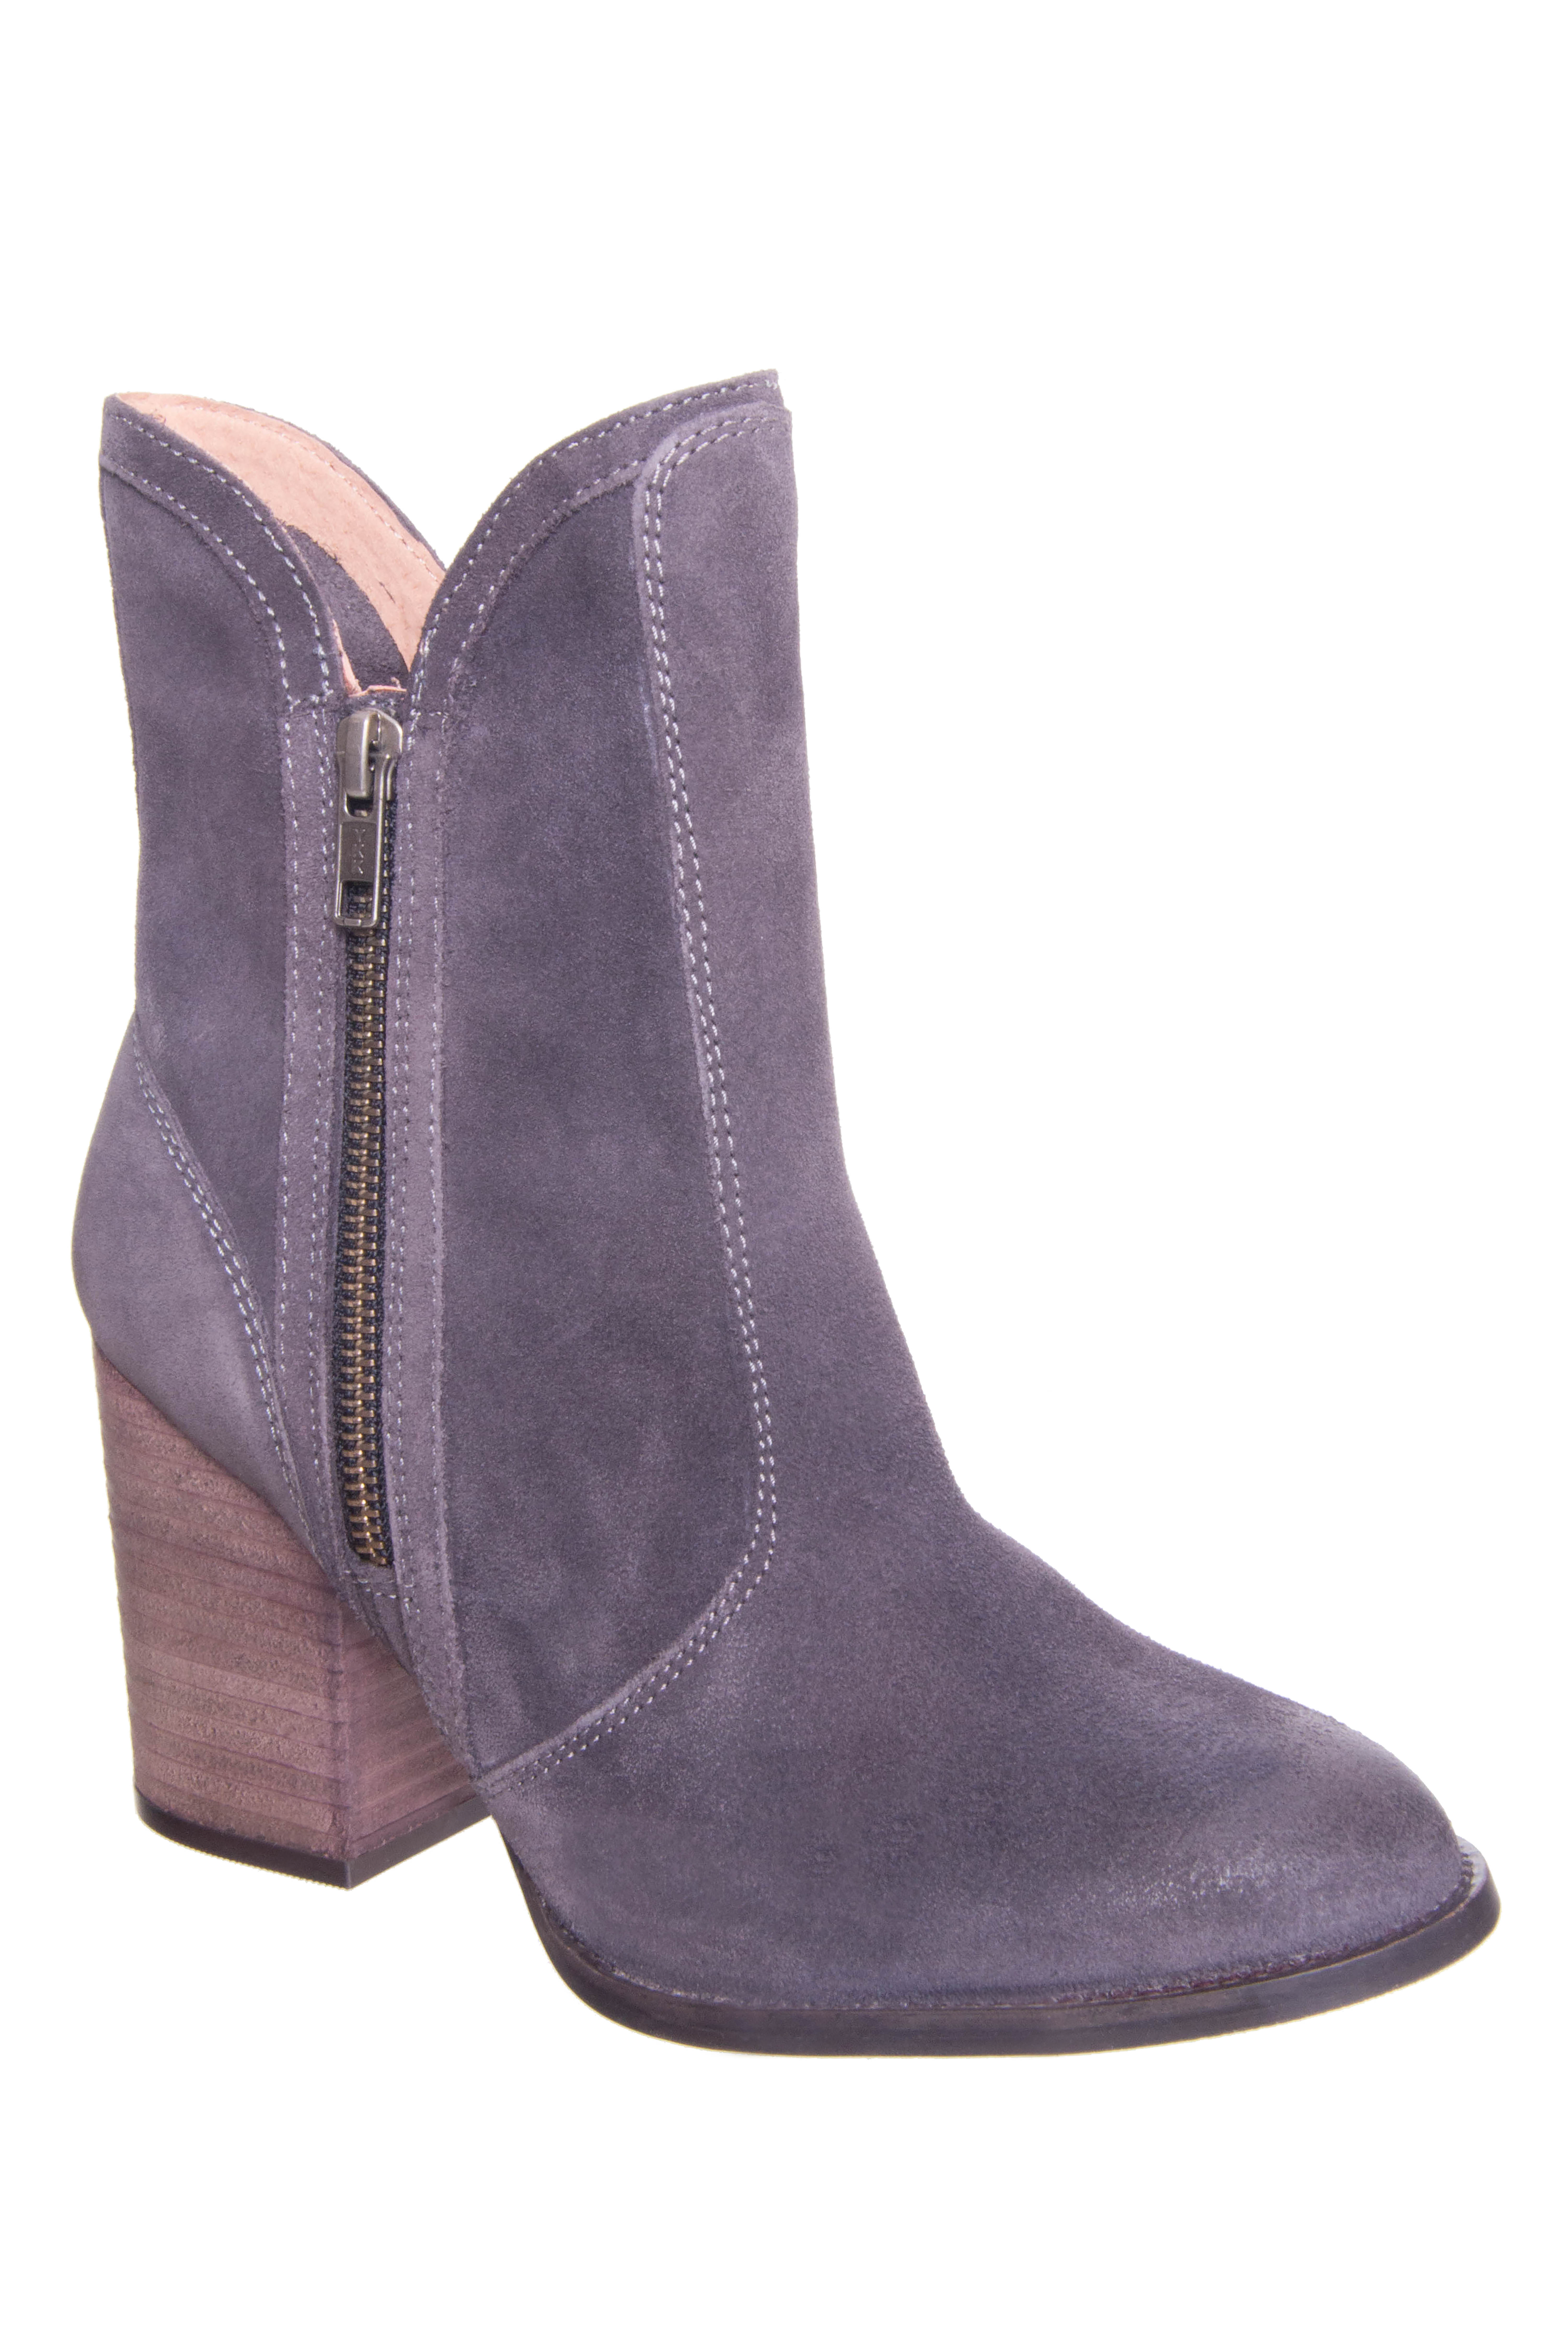 Seychelles Lori Penny High Heel Boots - Grey